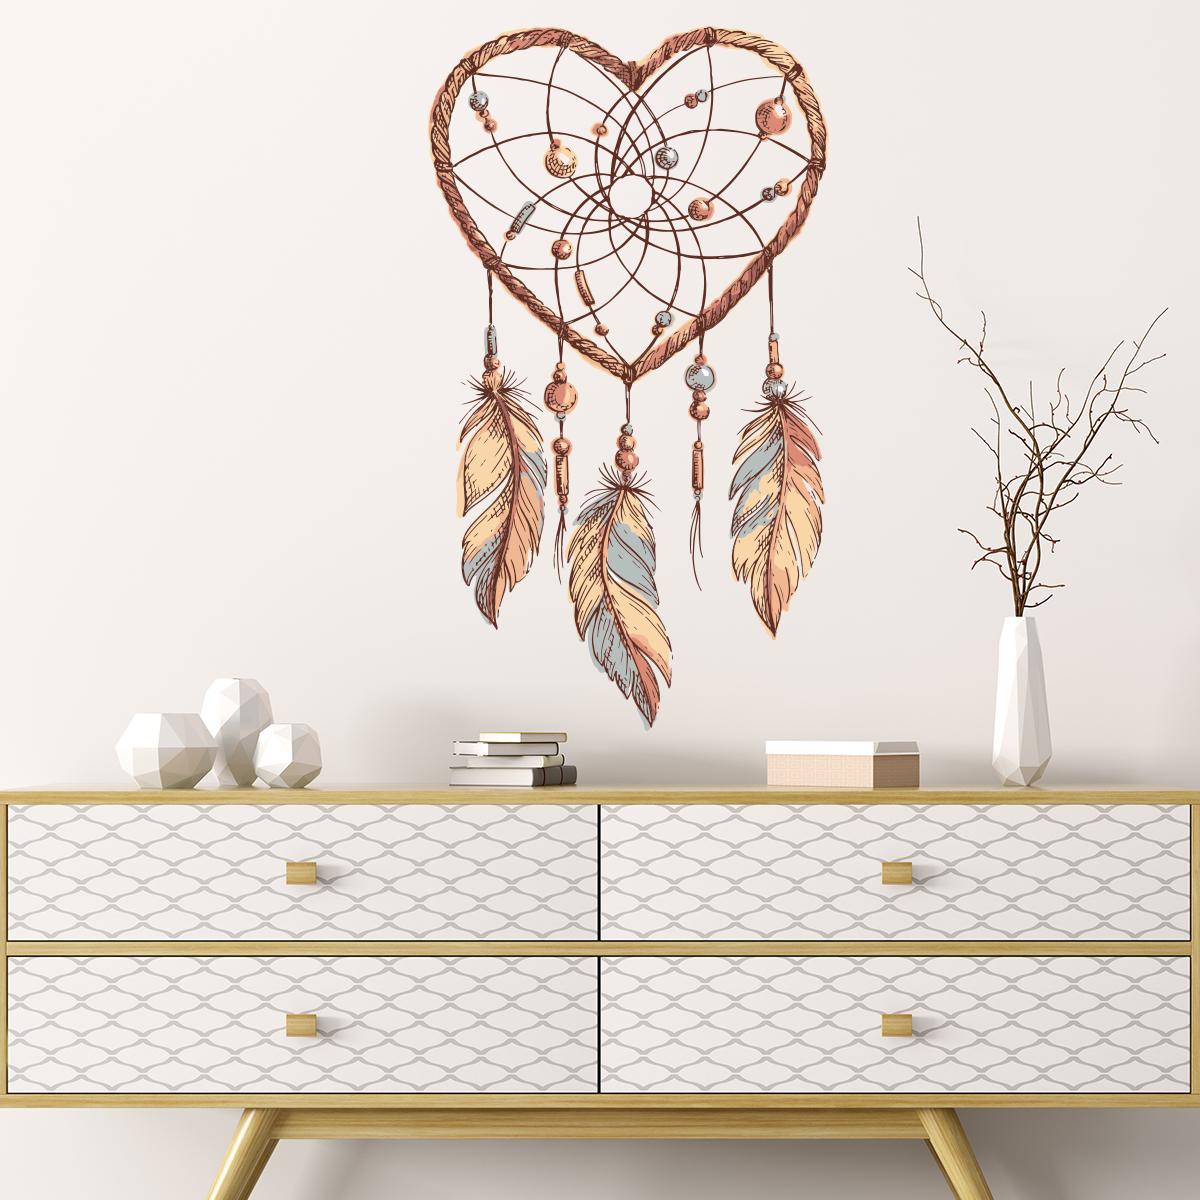 sticker boh me attrape r ve am rindien stickers art et design artistiques ambiance sticker. Black Bedroom Furniture Sets. Home Design Ideas